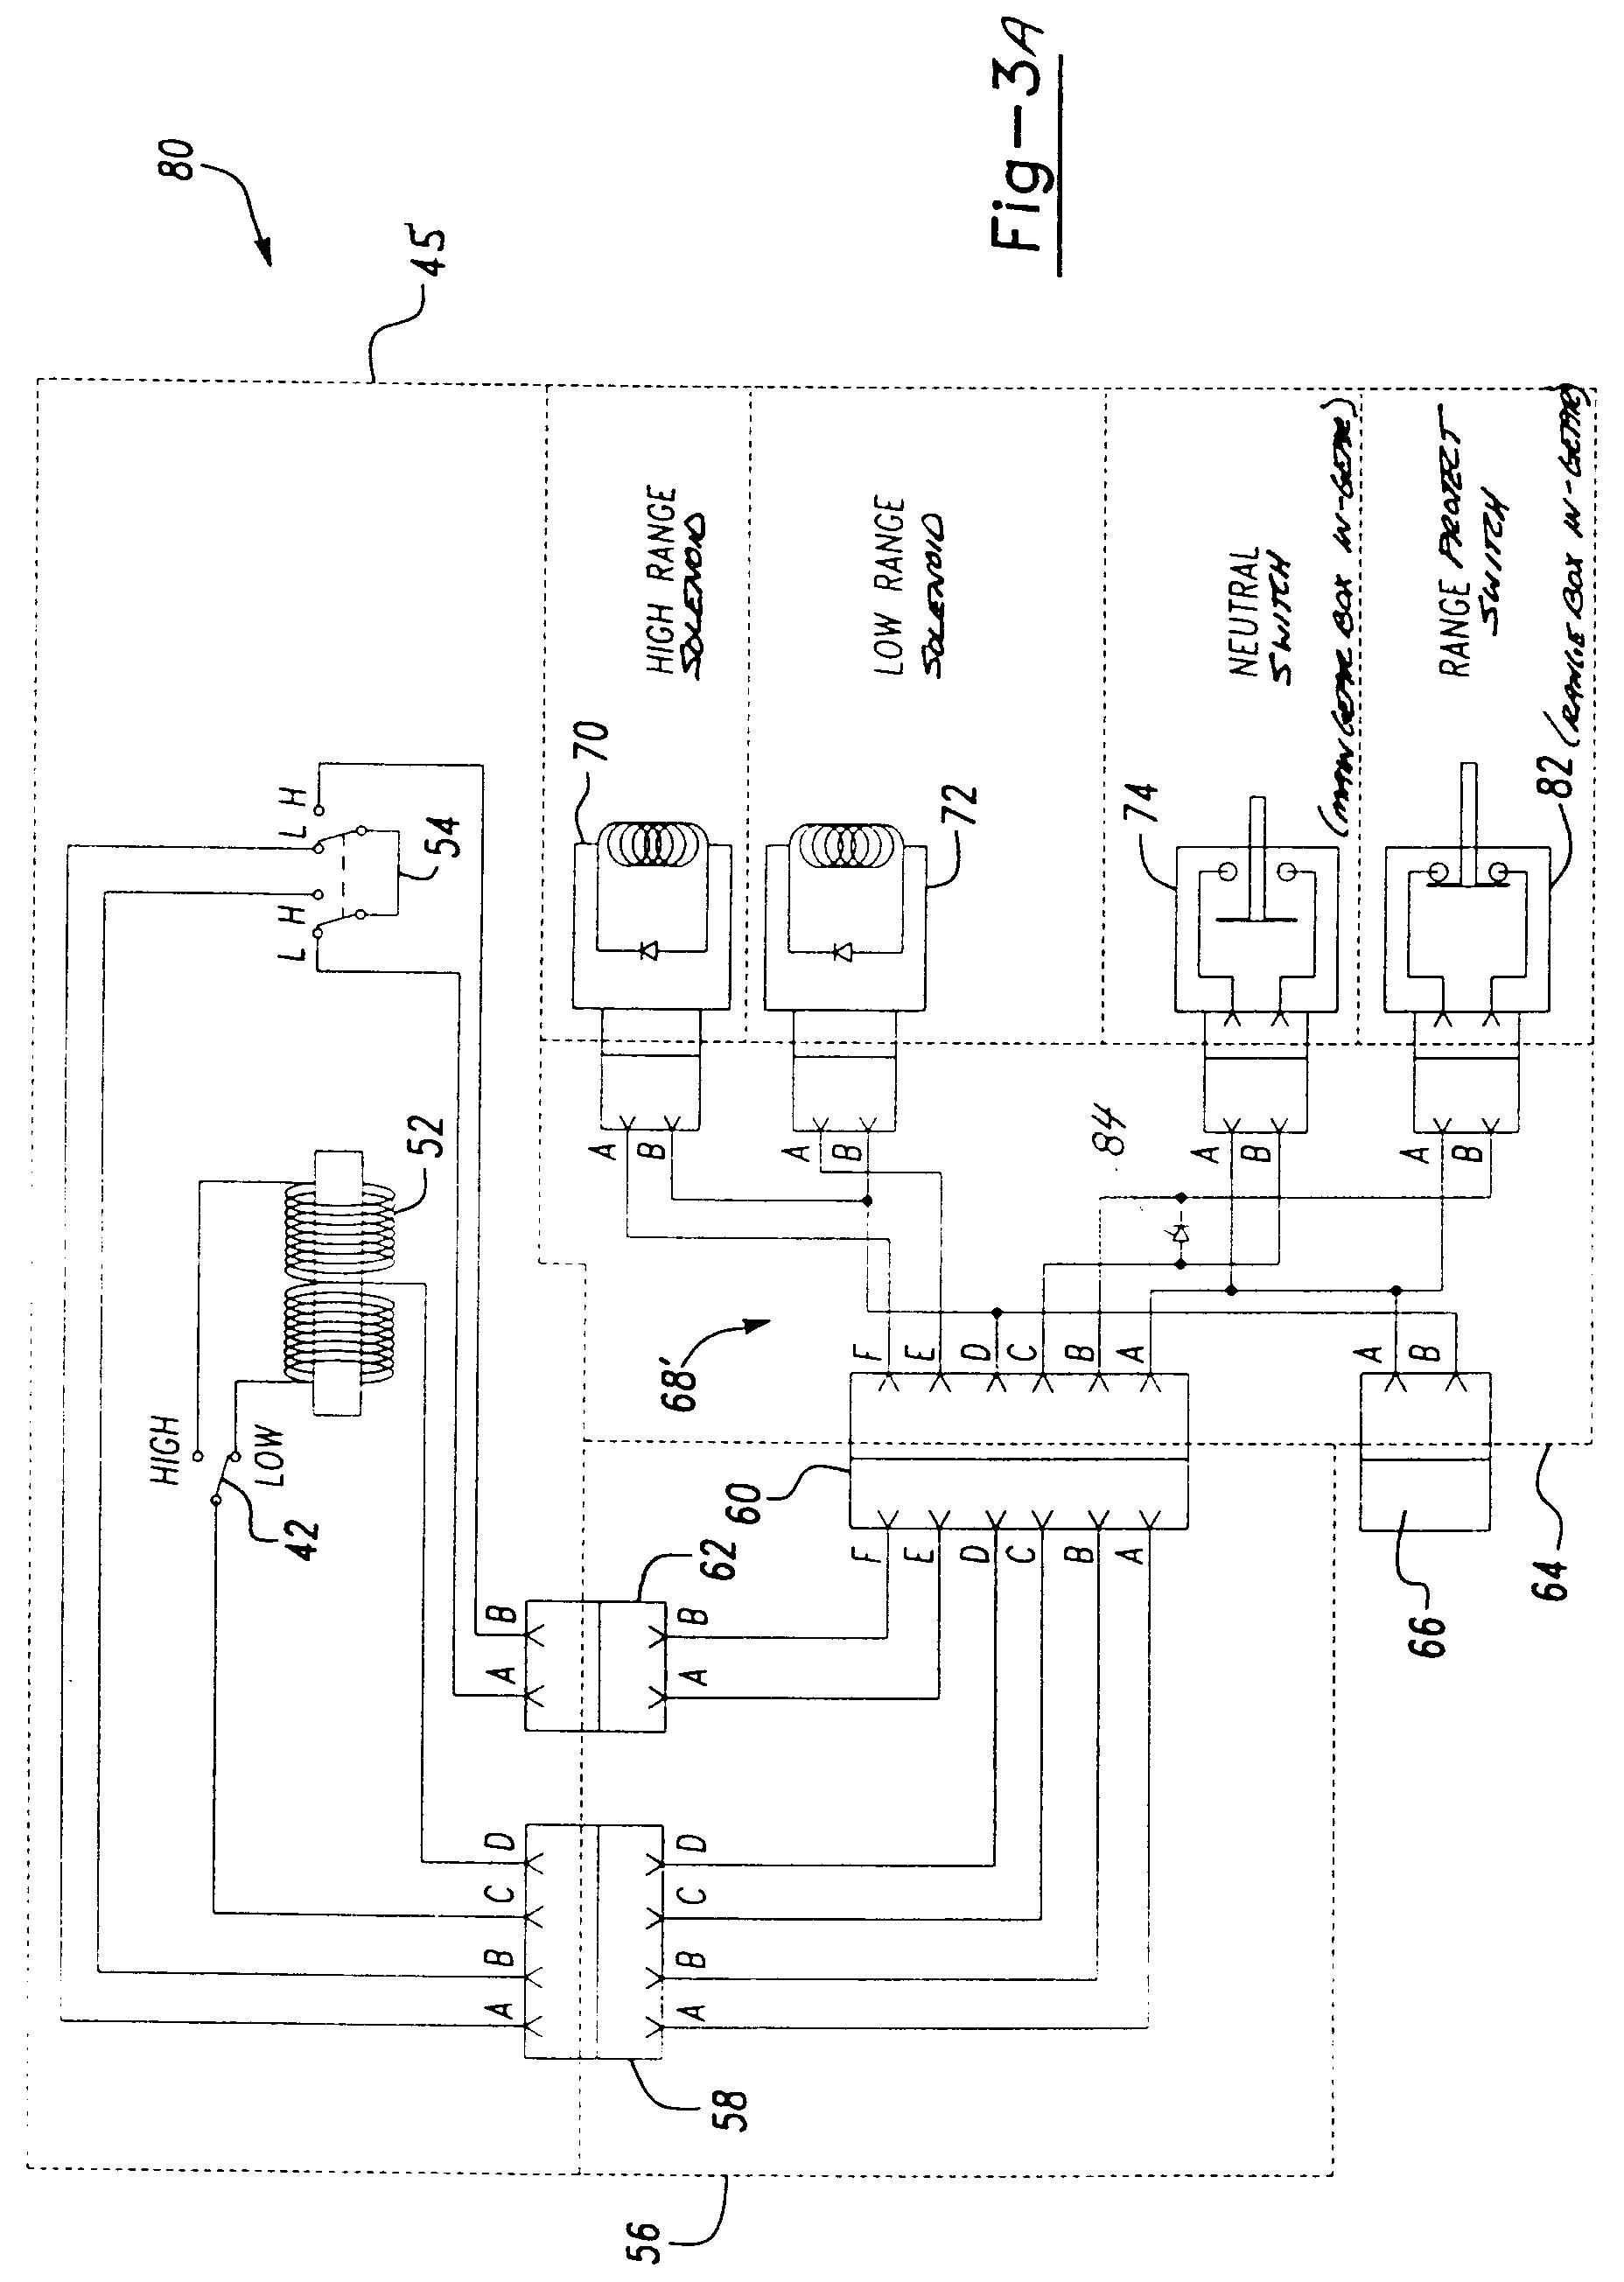 meritor transmission wiring diagram - 28 images - zf ... eaton 2 speed wiring diagram eaton breaker box wiring diagram #7